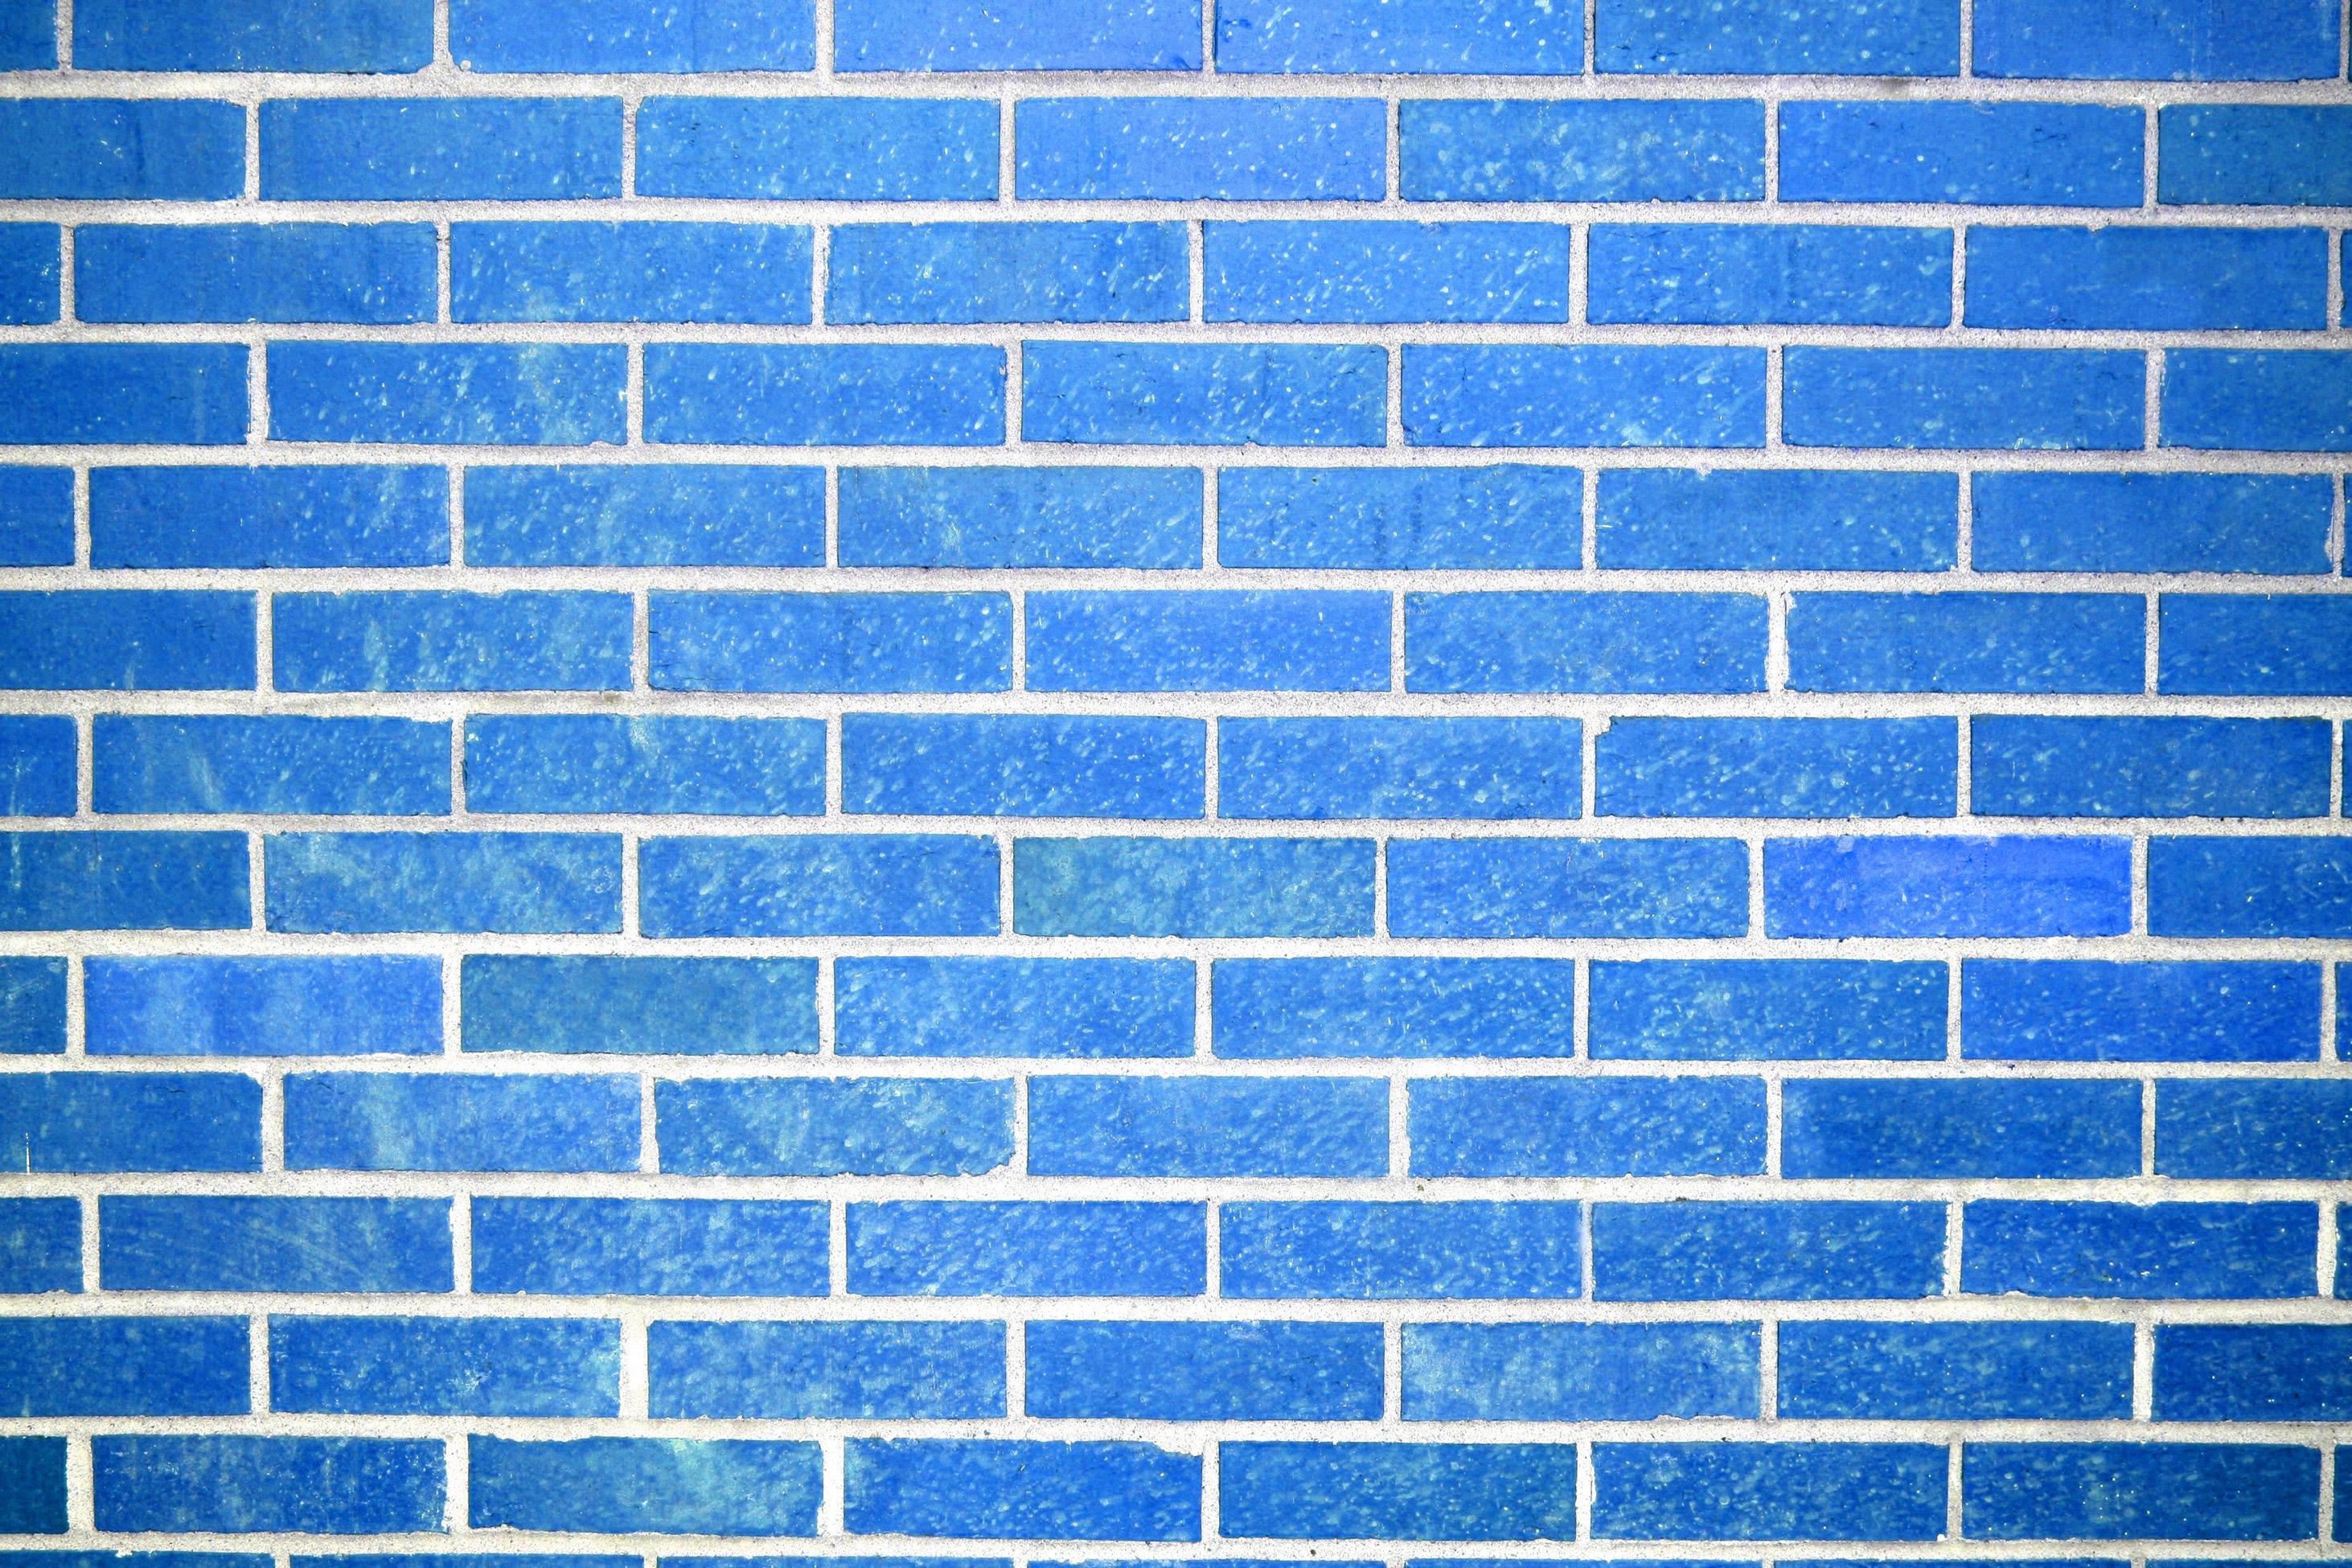 brick wall, texture, bricks, brick wall texture, background, download, bricks